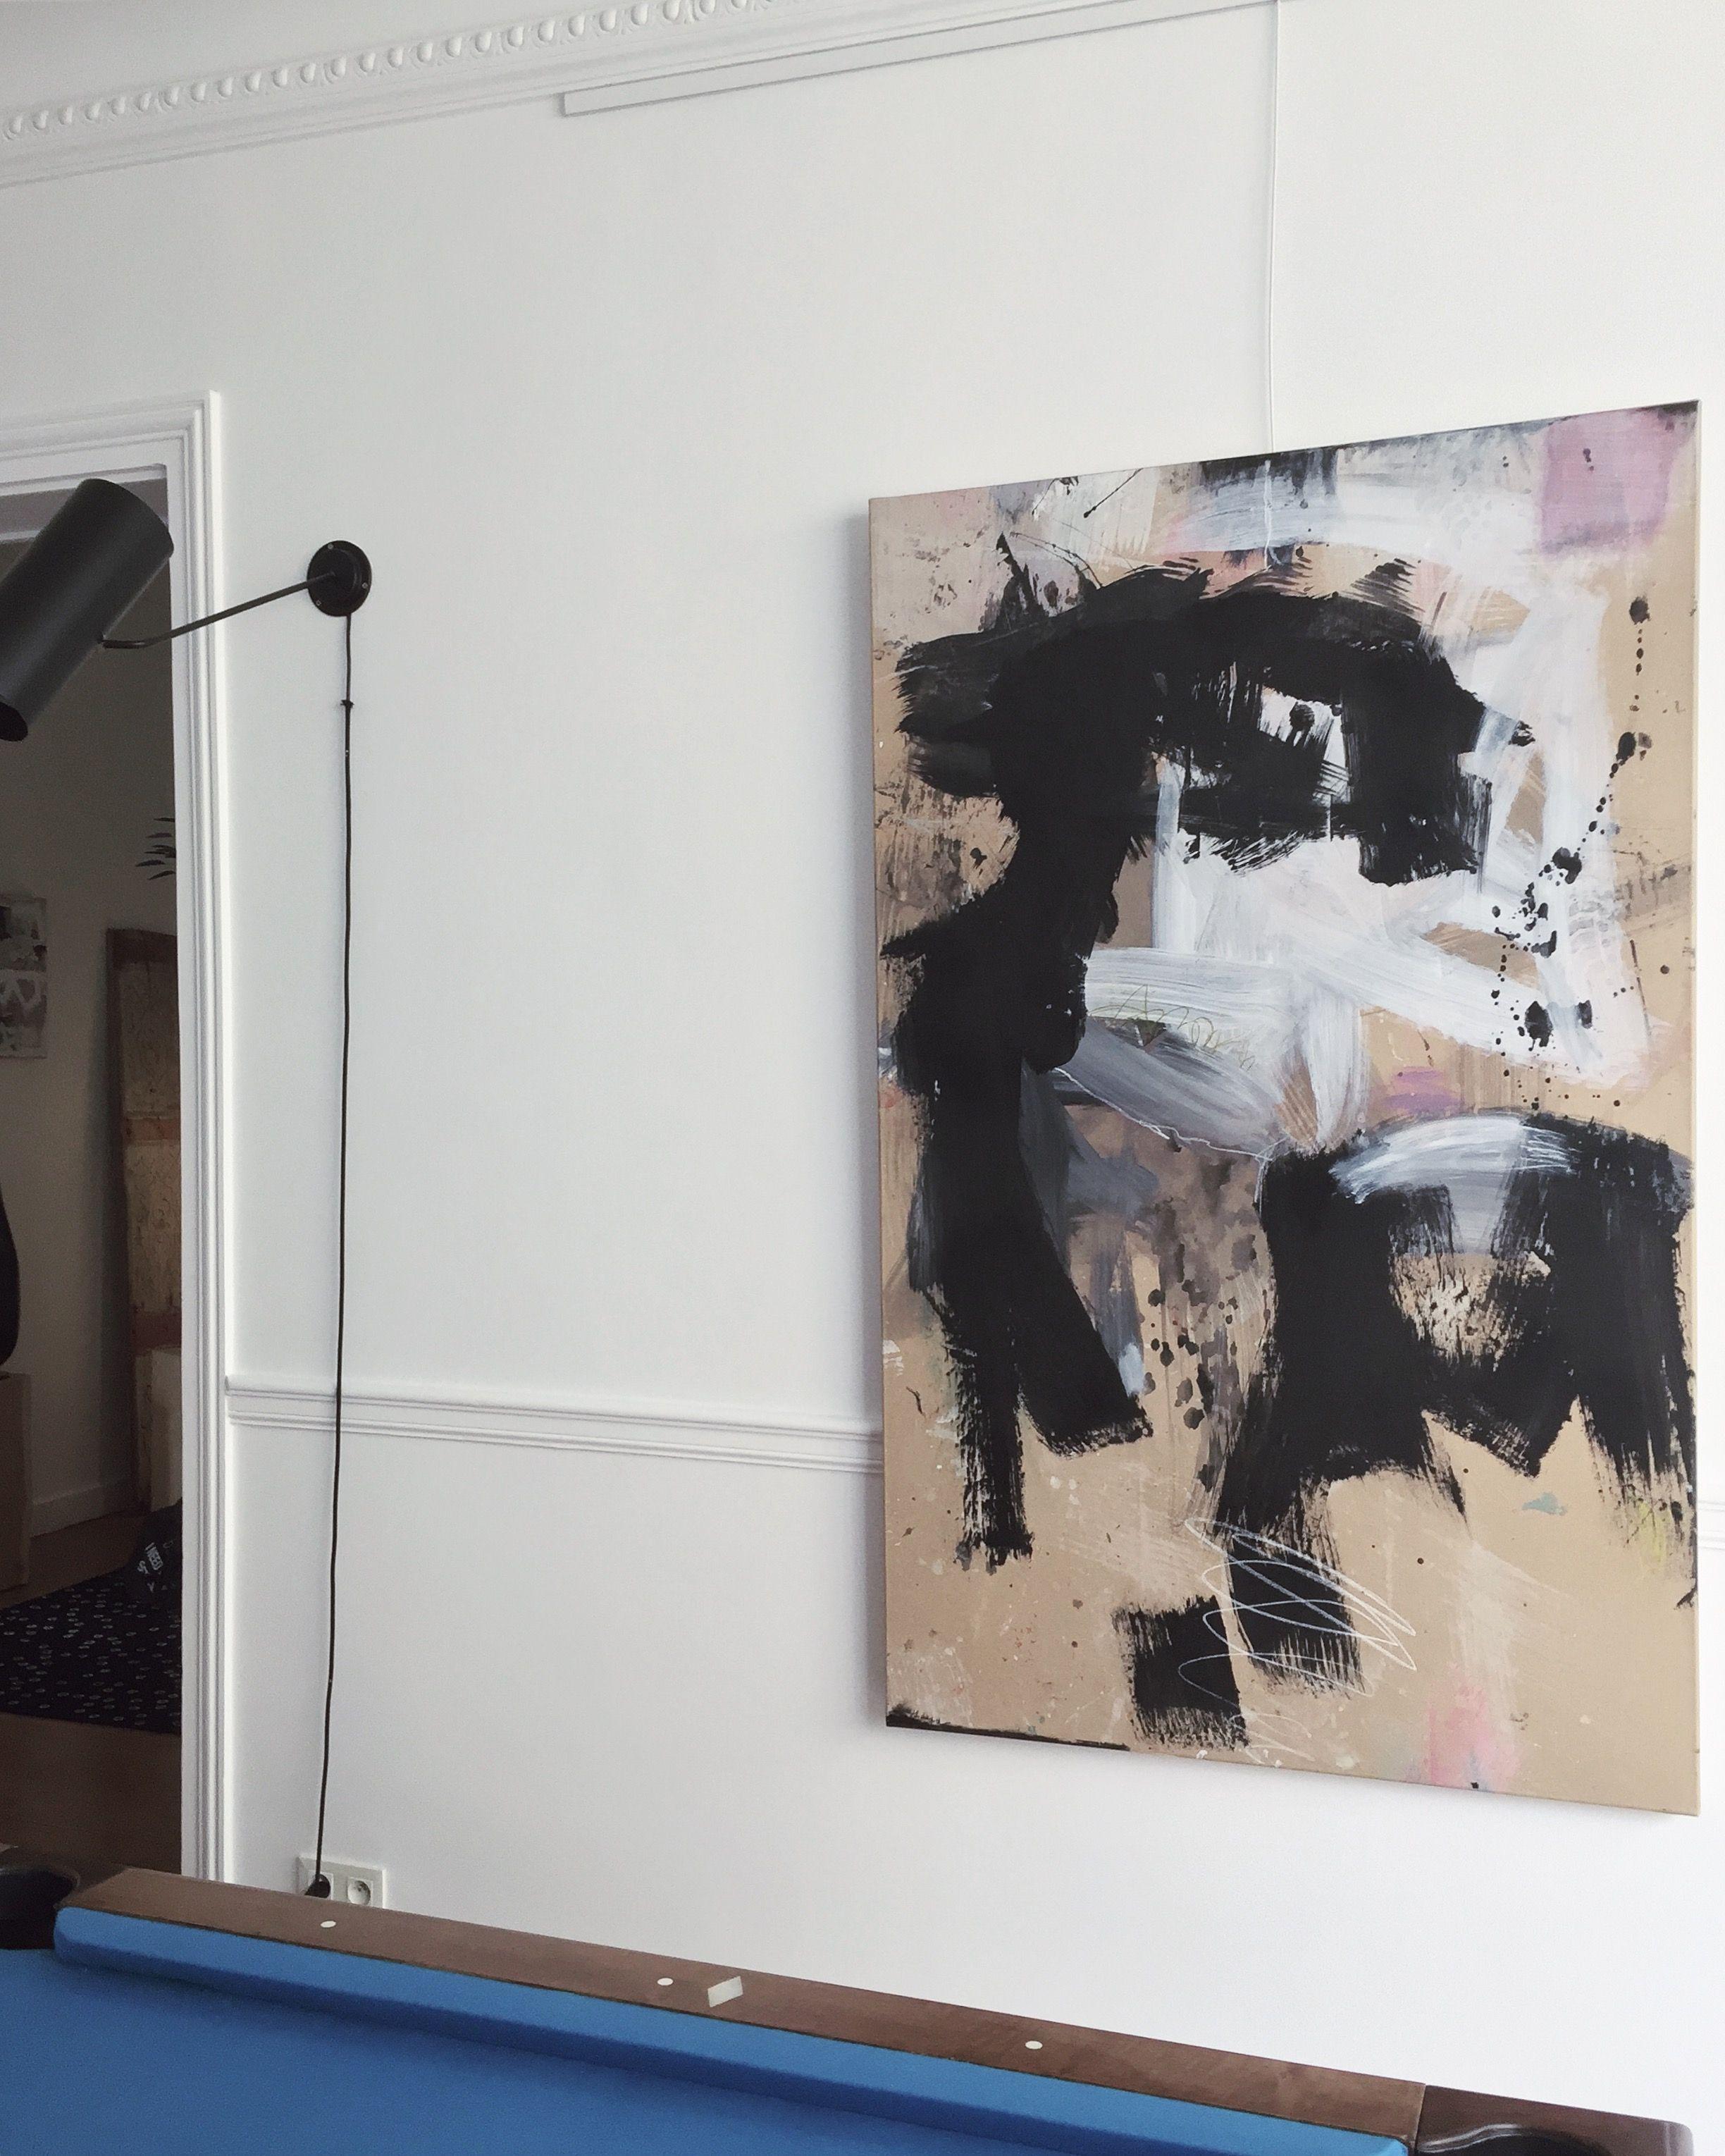 Exposition Jean Charles Millepied... #peinture #oeuvre #art #tableau  #painting #millepied #tableau #moderne #contemporain #zeuxis #galerie  #abstrait